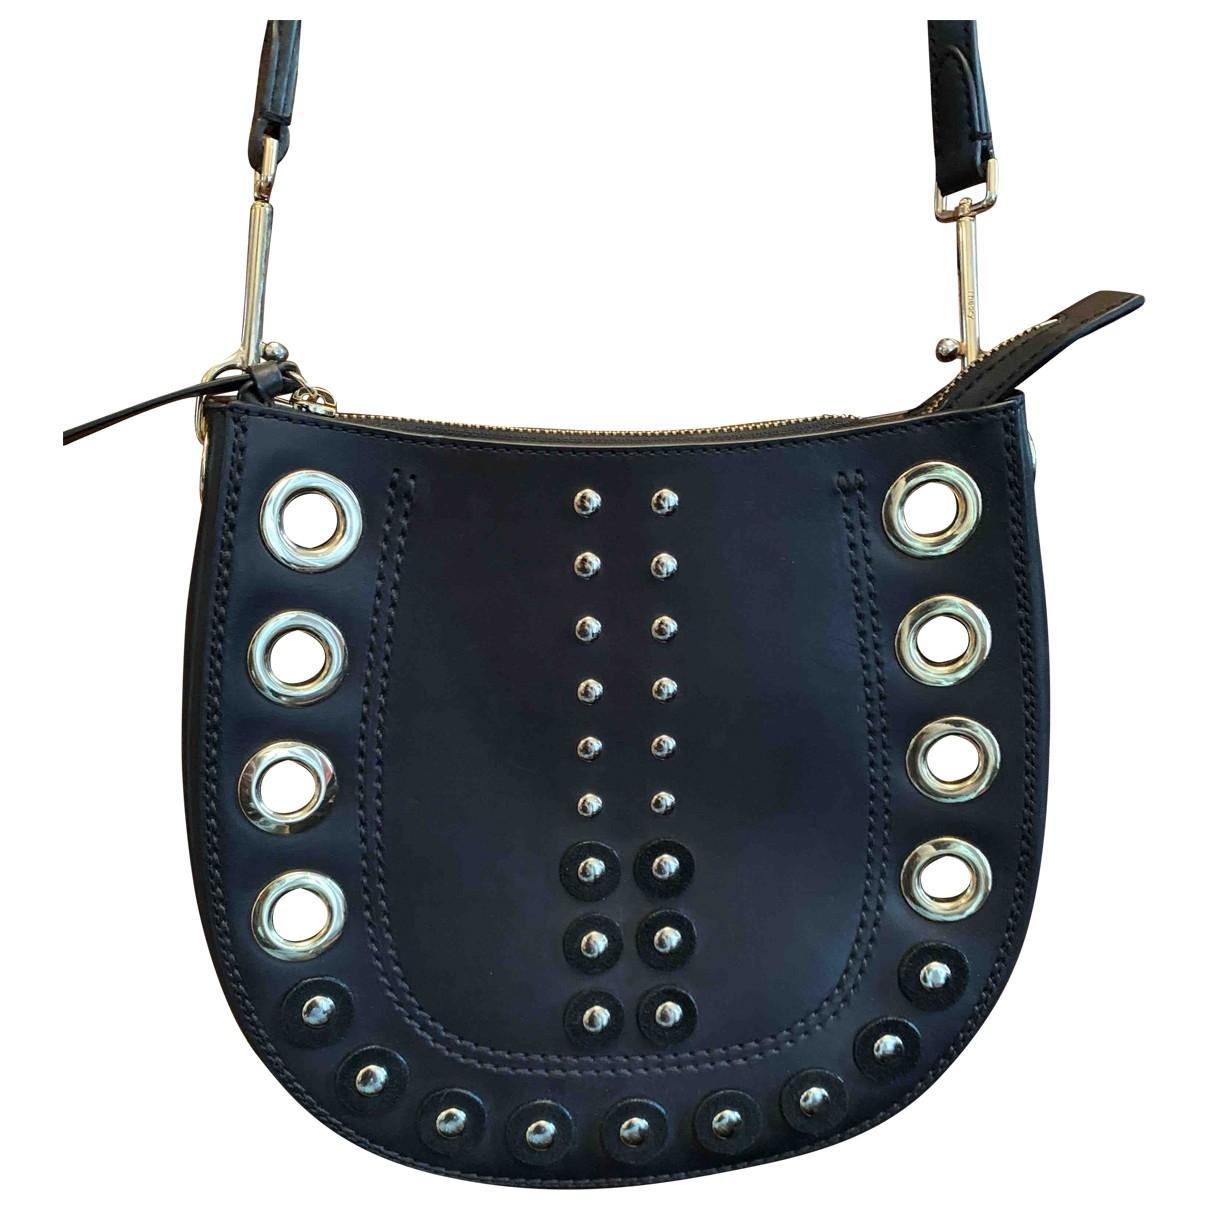 Theory \N Black Leather handbag for Women \N